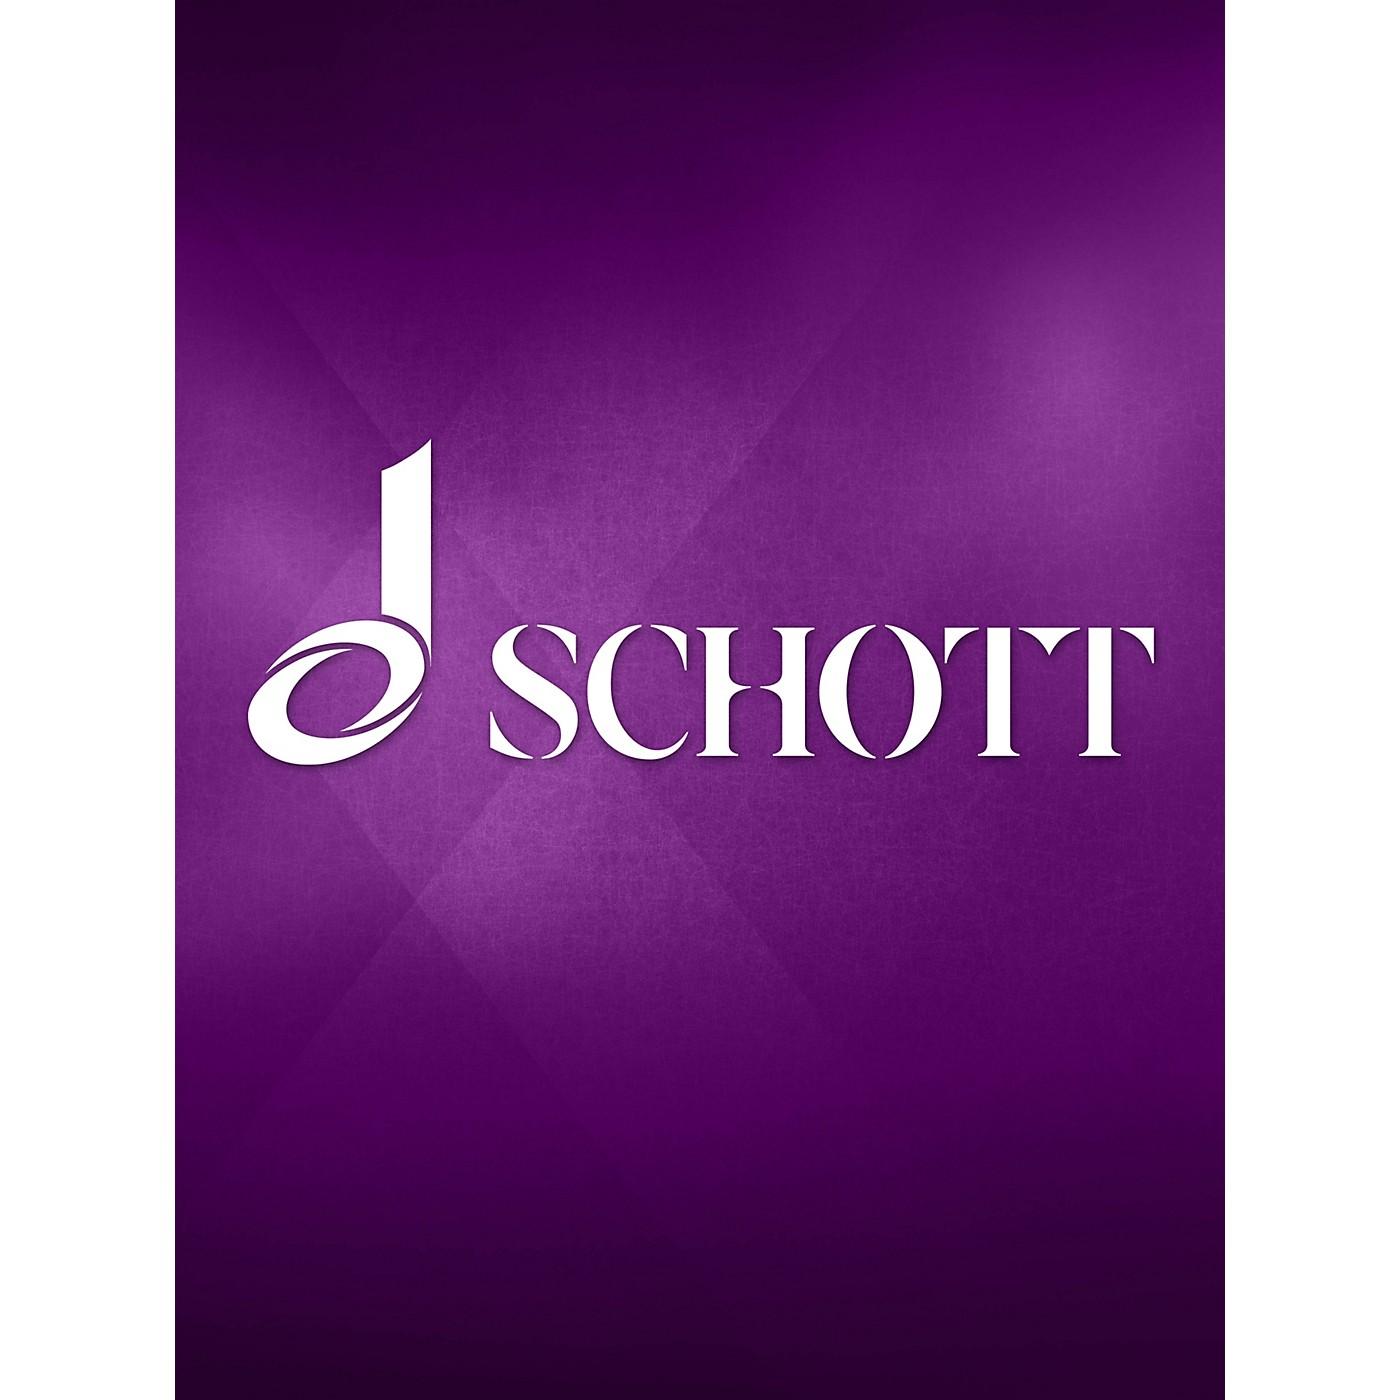 Hal Leonard Sieben Gragmente Fur Orchestra In Memoriam Robert Schumann Study Score Study Score Series thumbnail